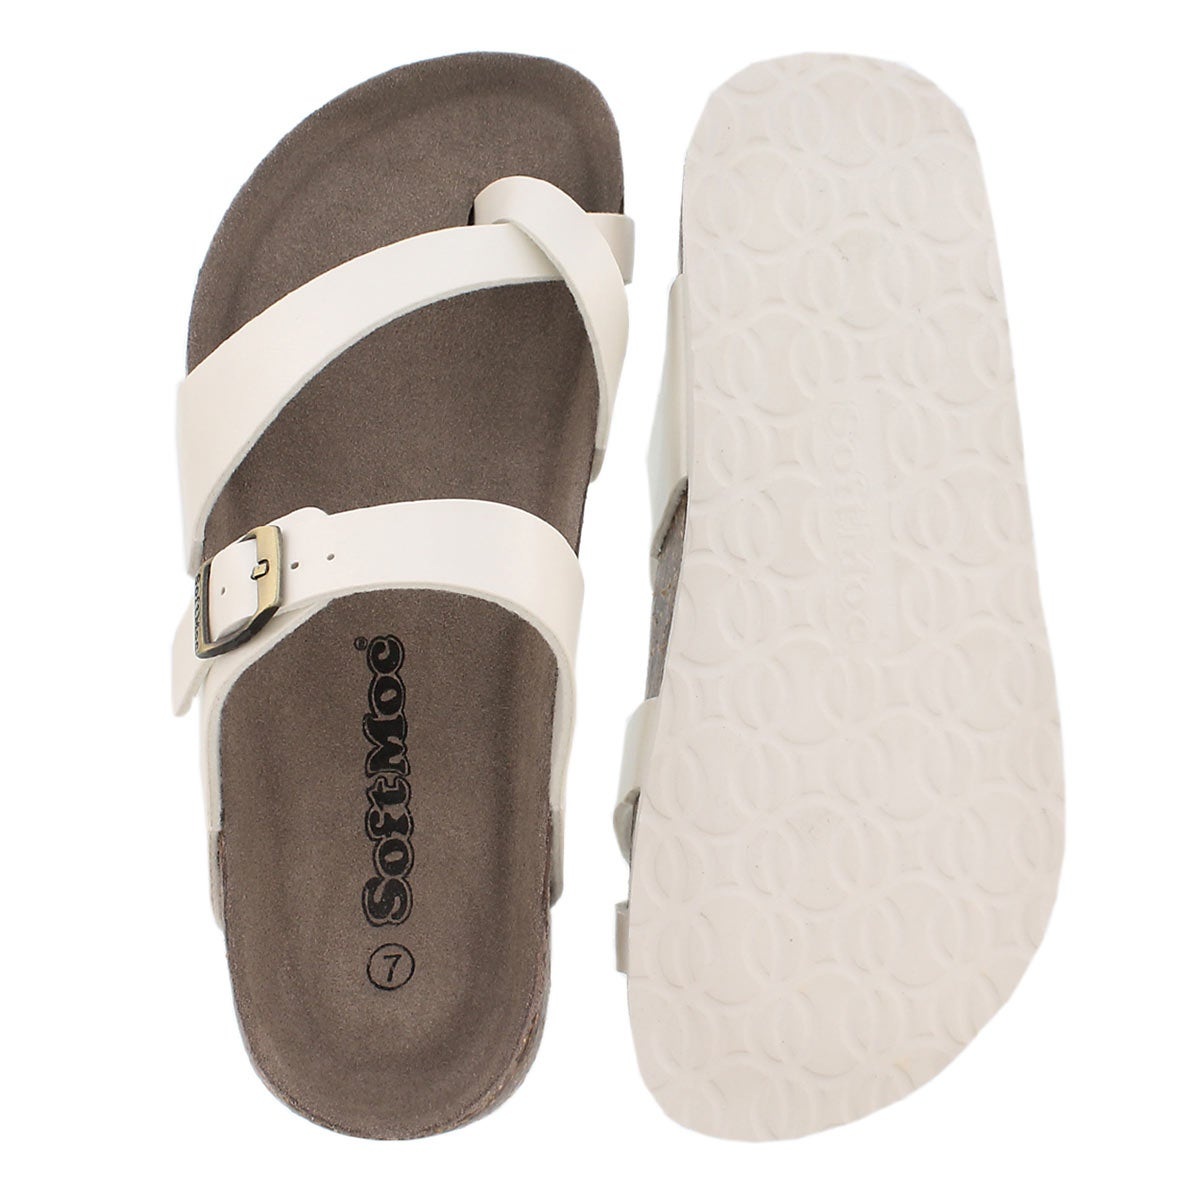 Lds Alicia3 moonstone memory foam sandal